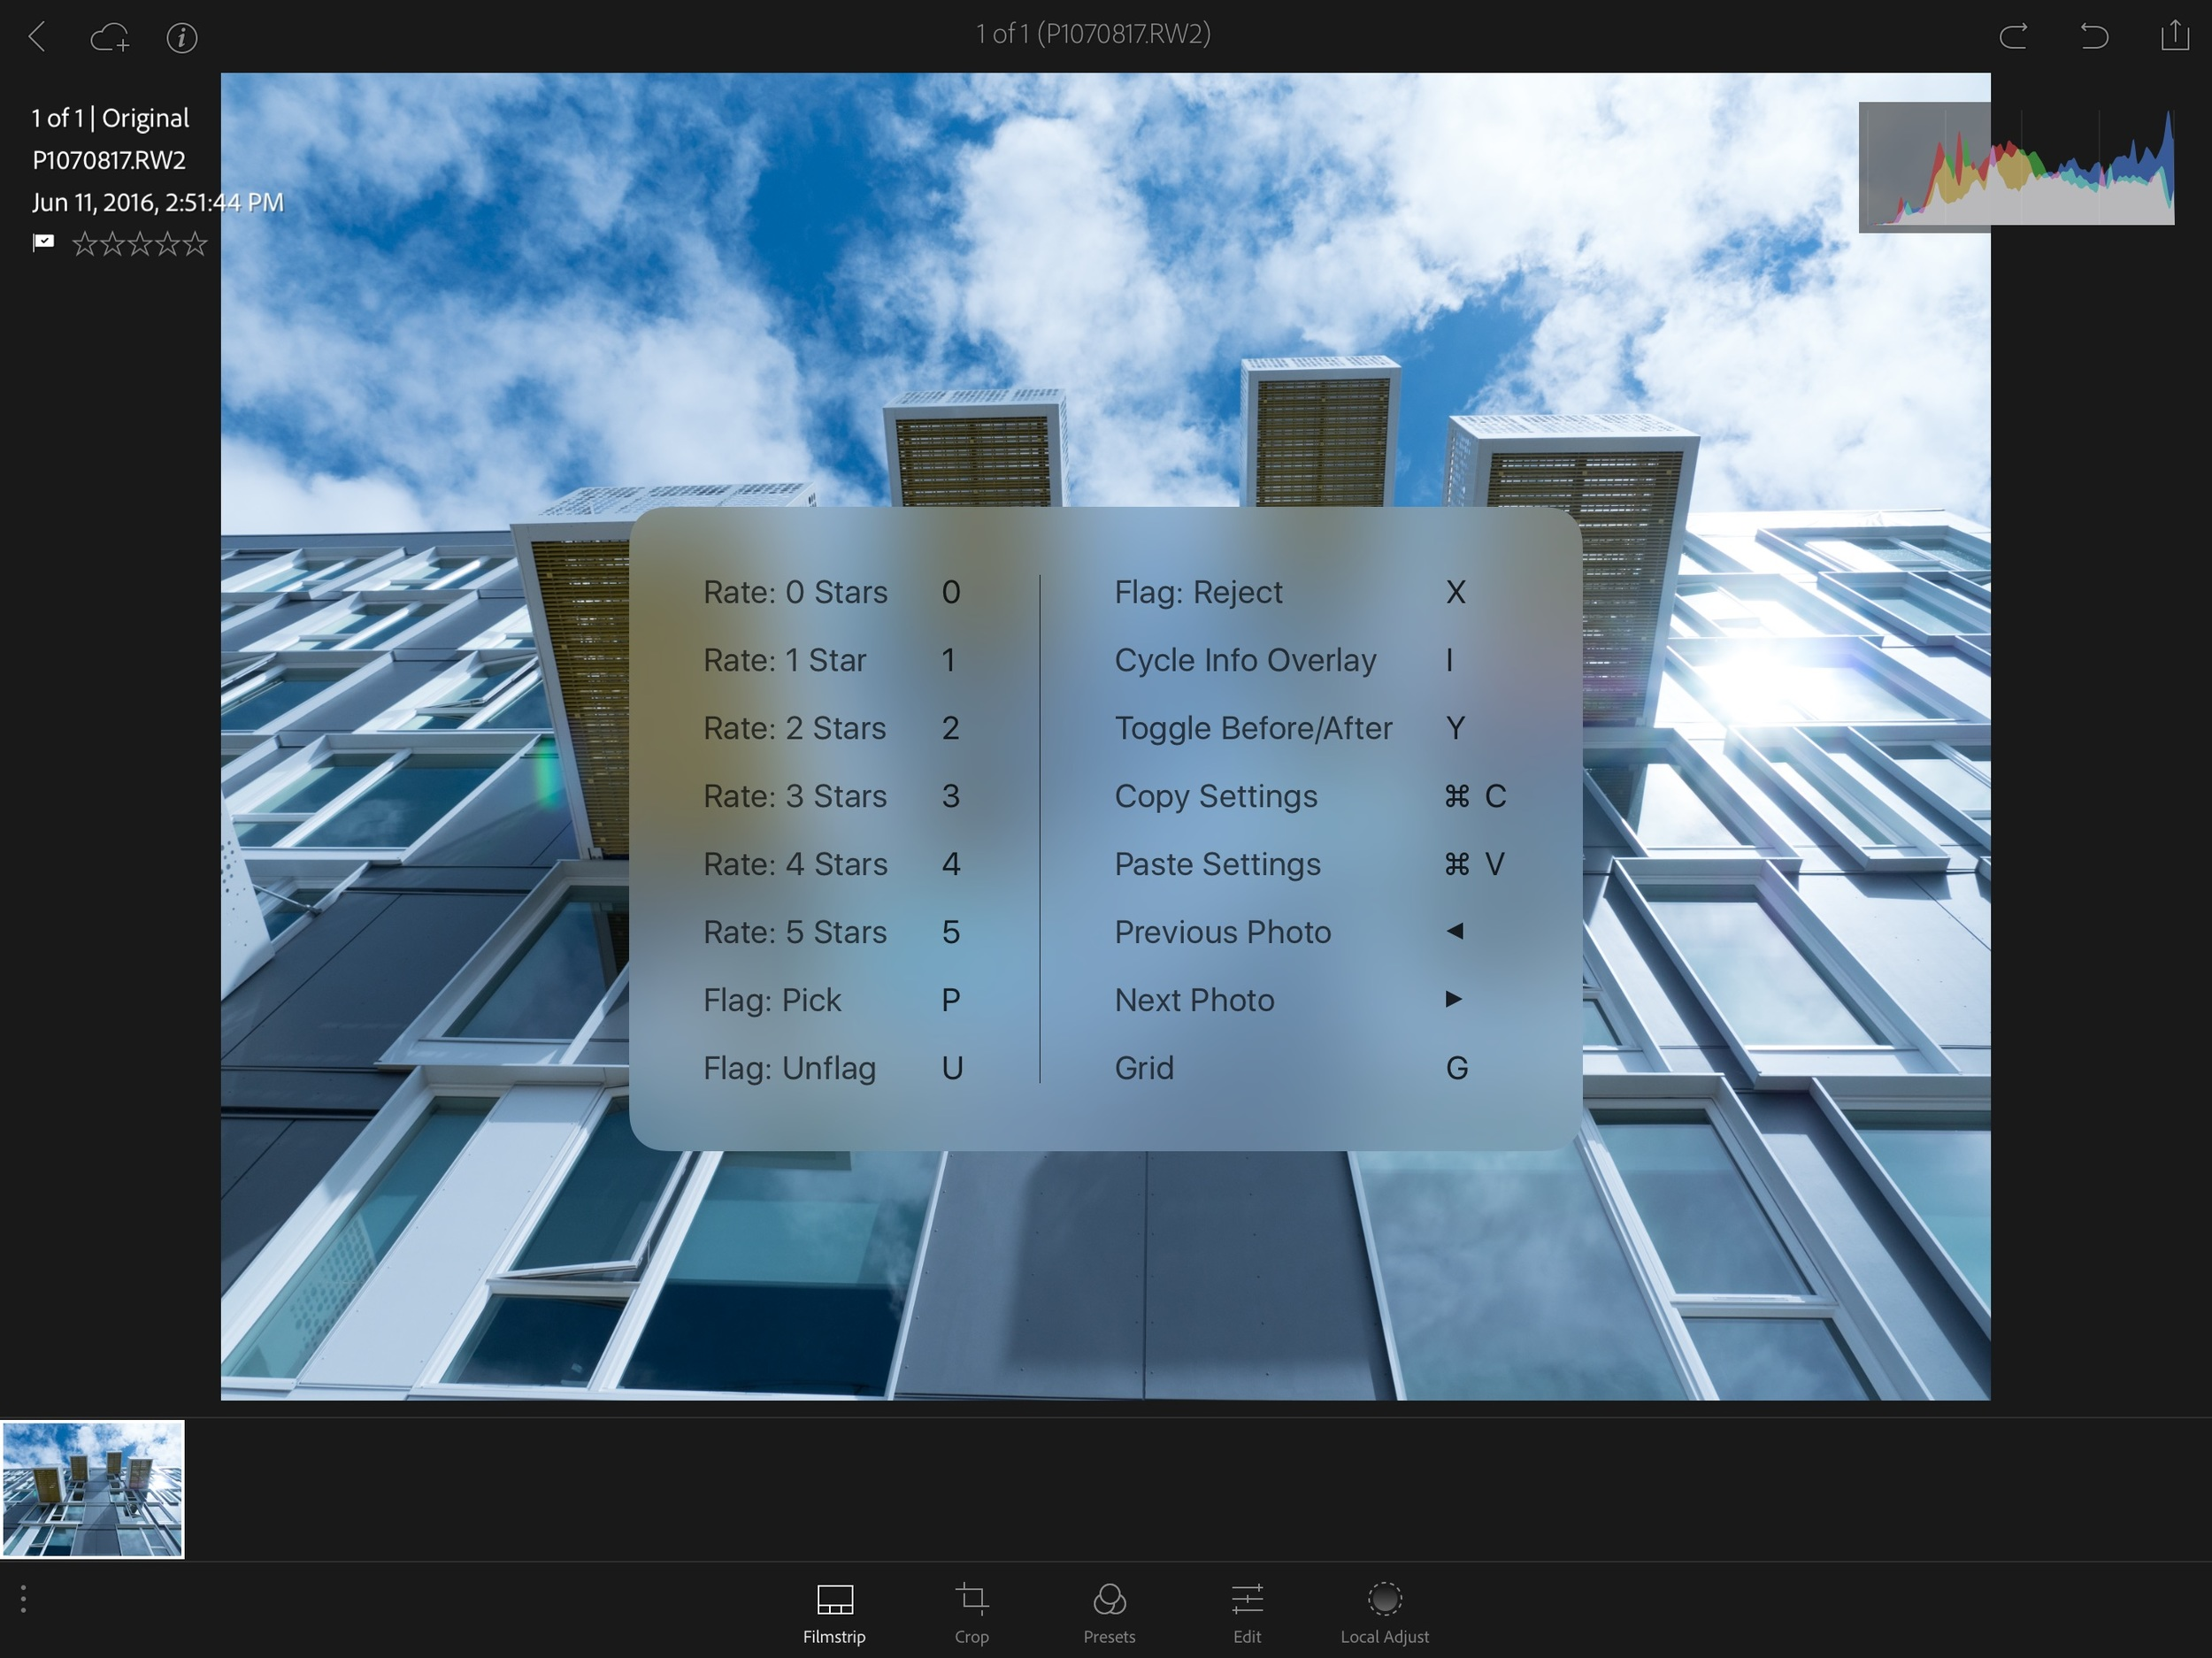 Keyboard Shortcuts for iPad Pro